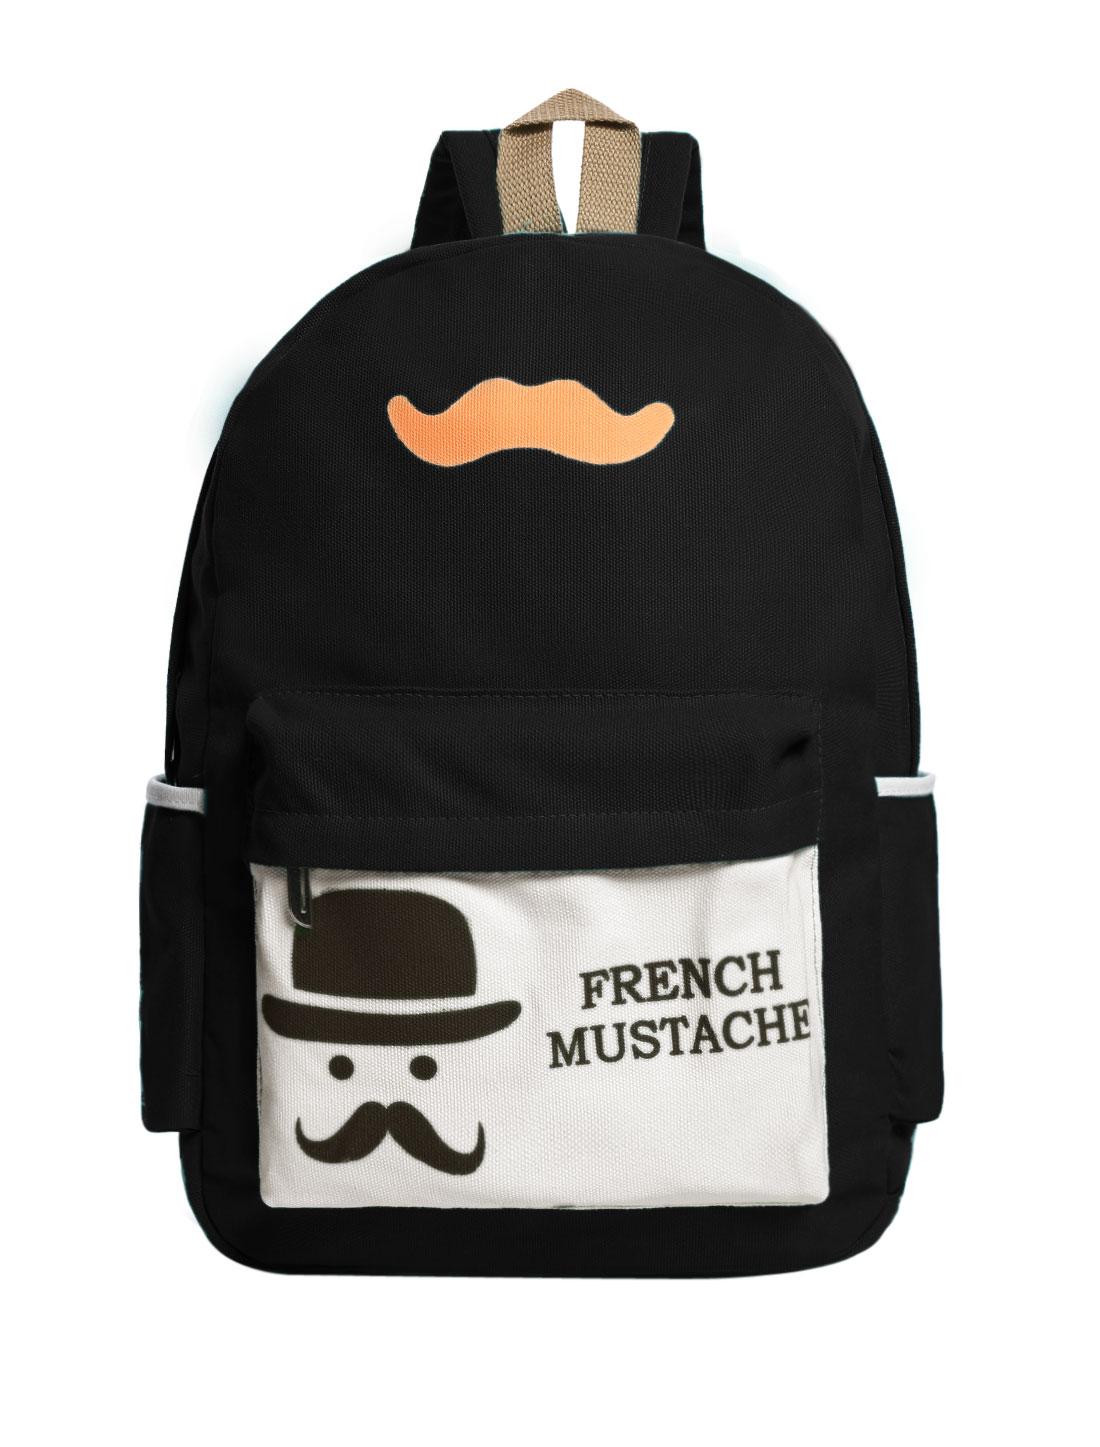 Women Canvas Backpack Travel Satchel School Book Bag Rucksack Black